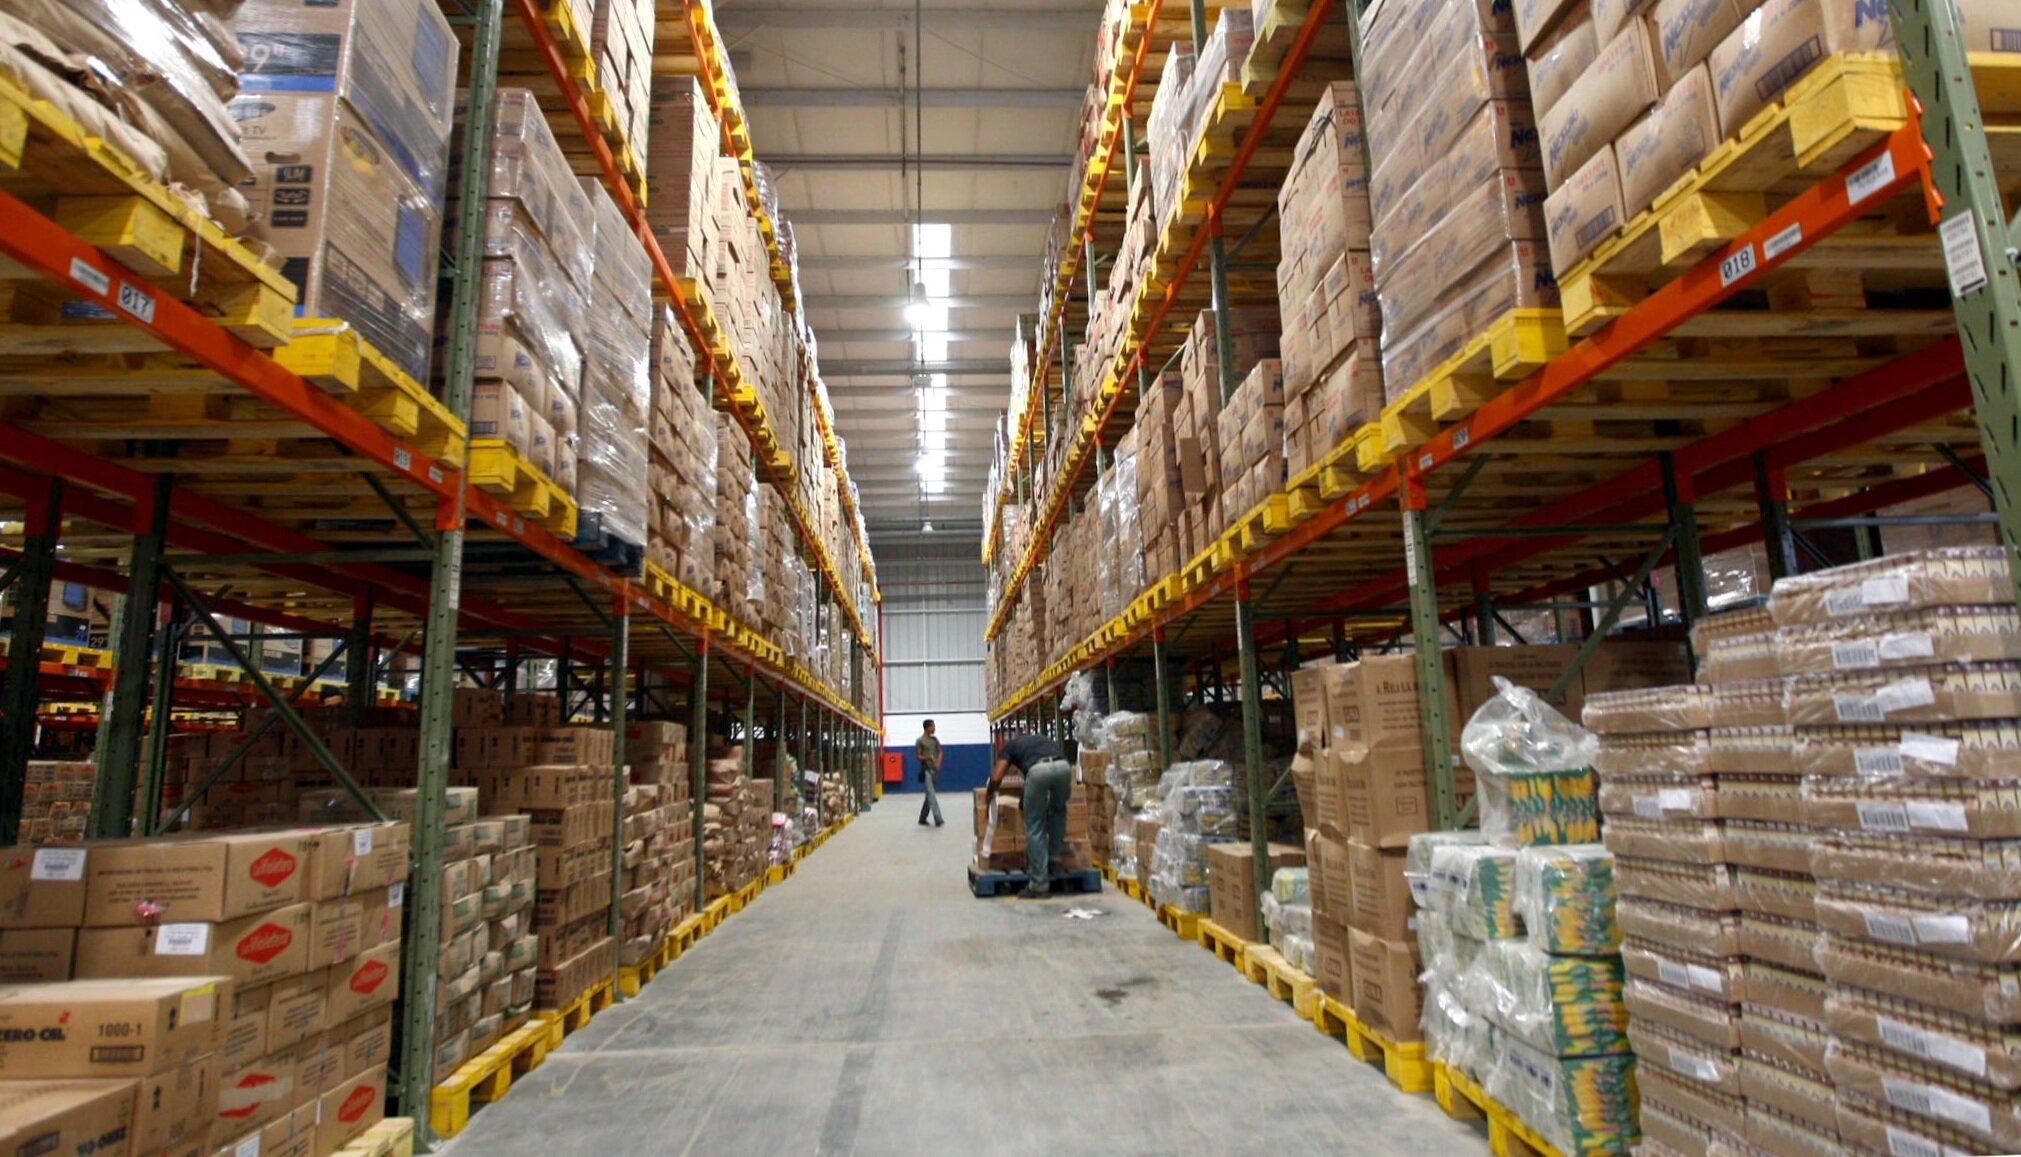 Warehouse_of_Grupo_Martins_in_Cama%C3%A7ari_%28Brazil%29.jpg